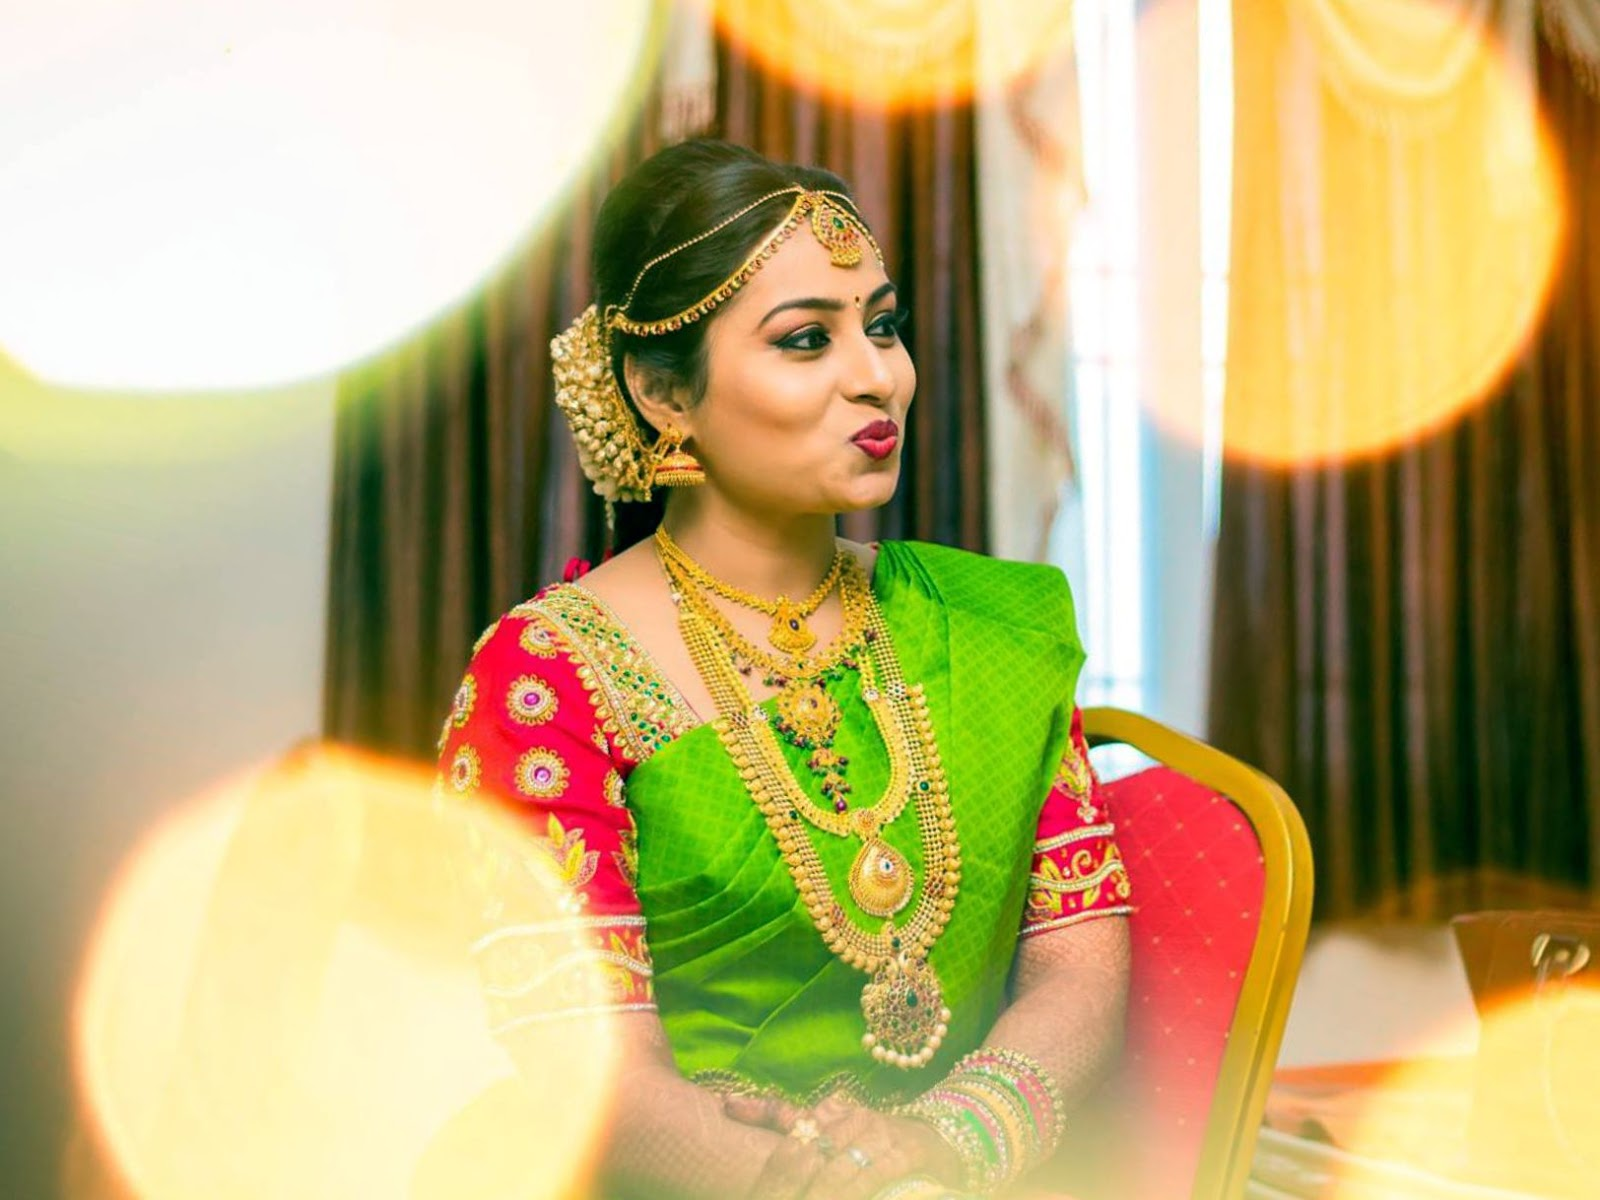 Mallu Bhabhi Cute Photos In Saree  Hot And Sexy